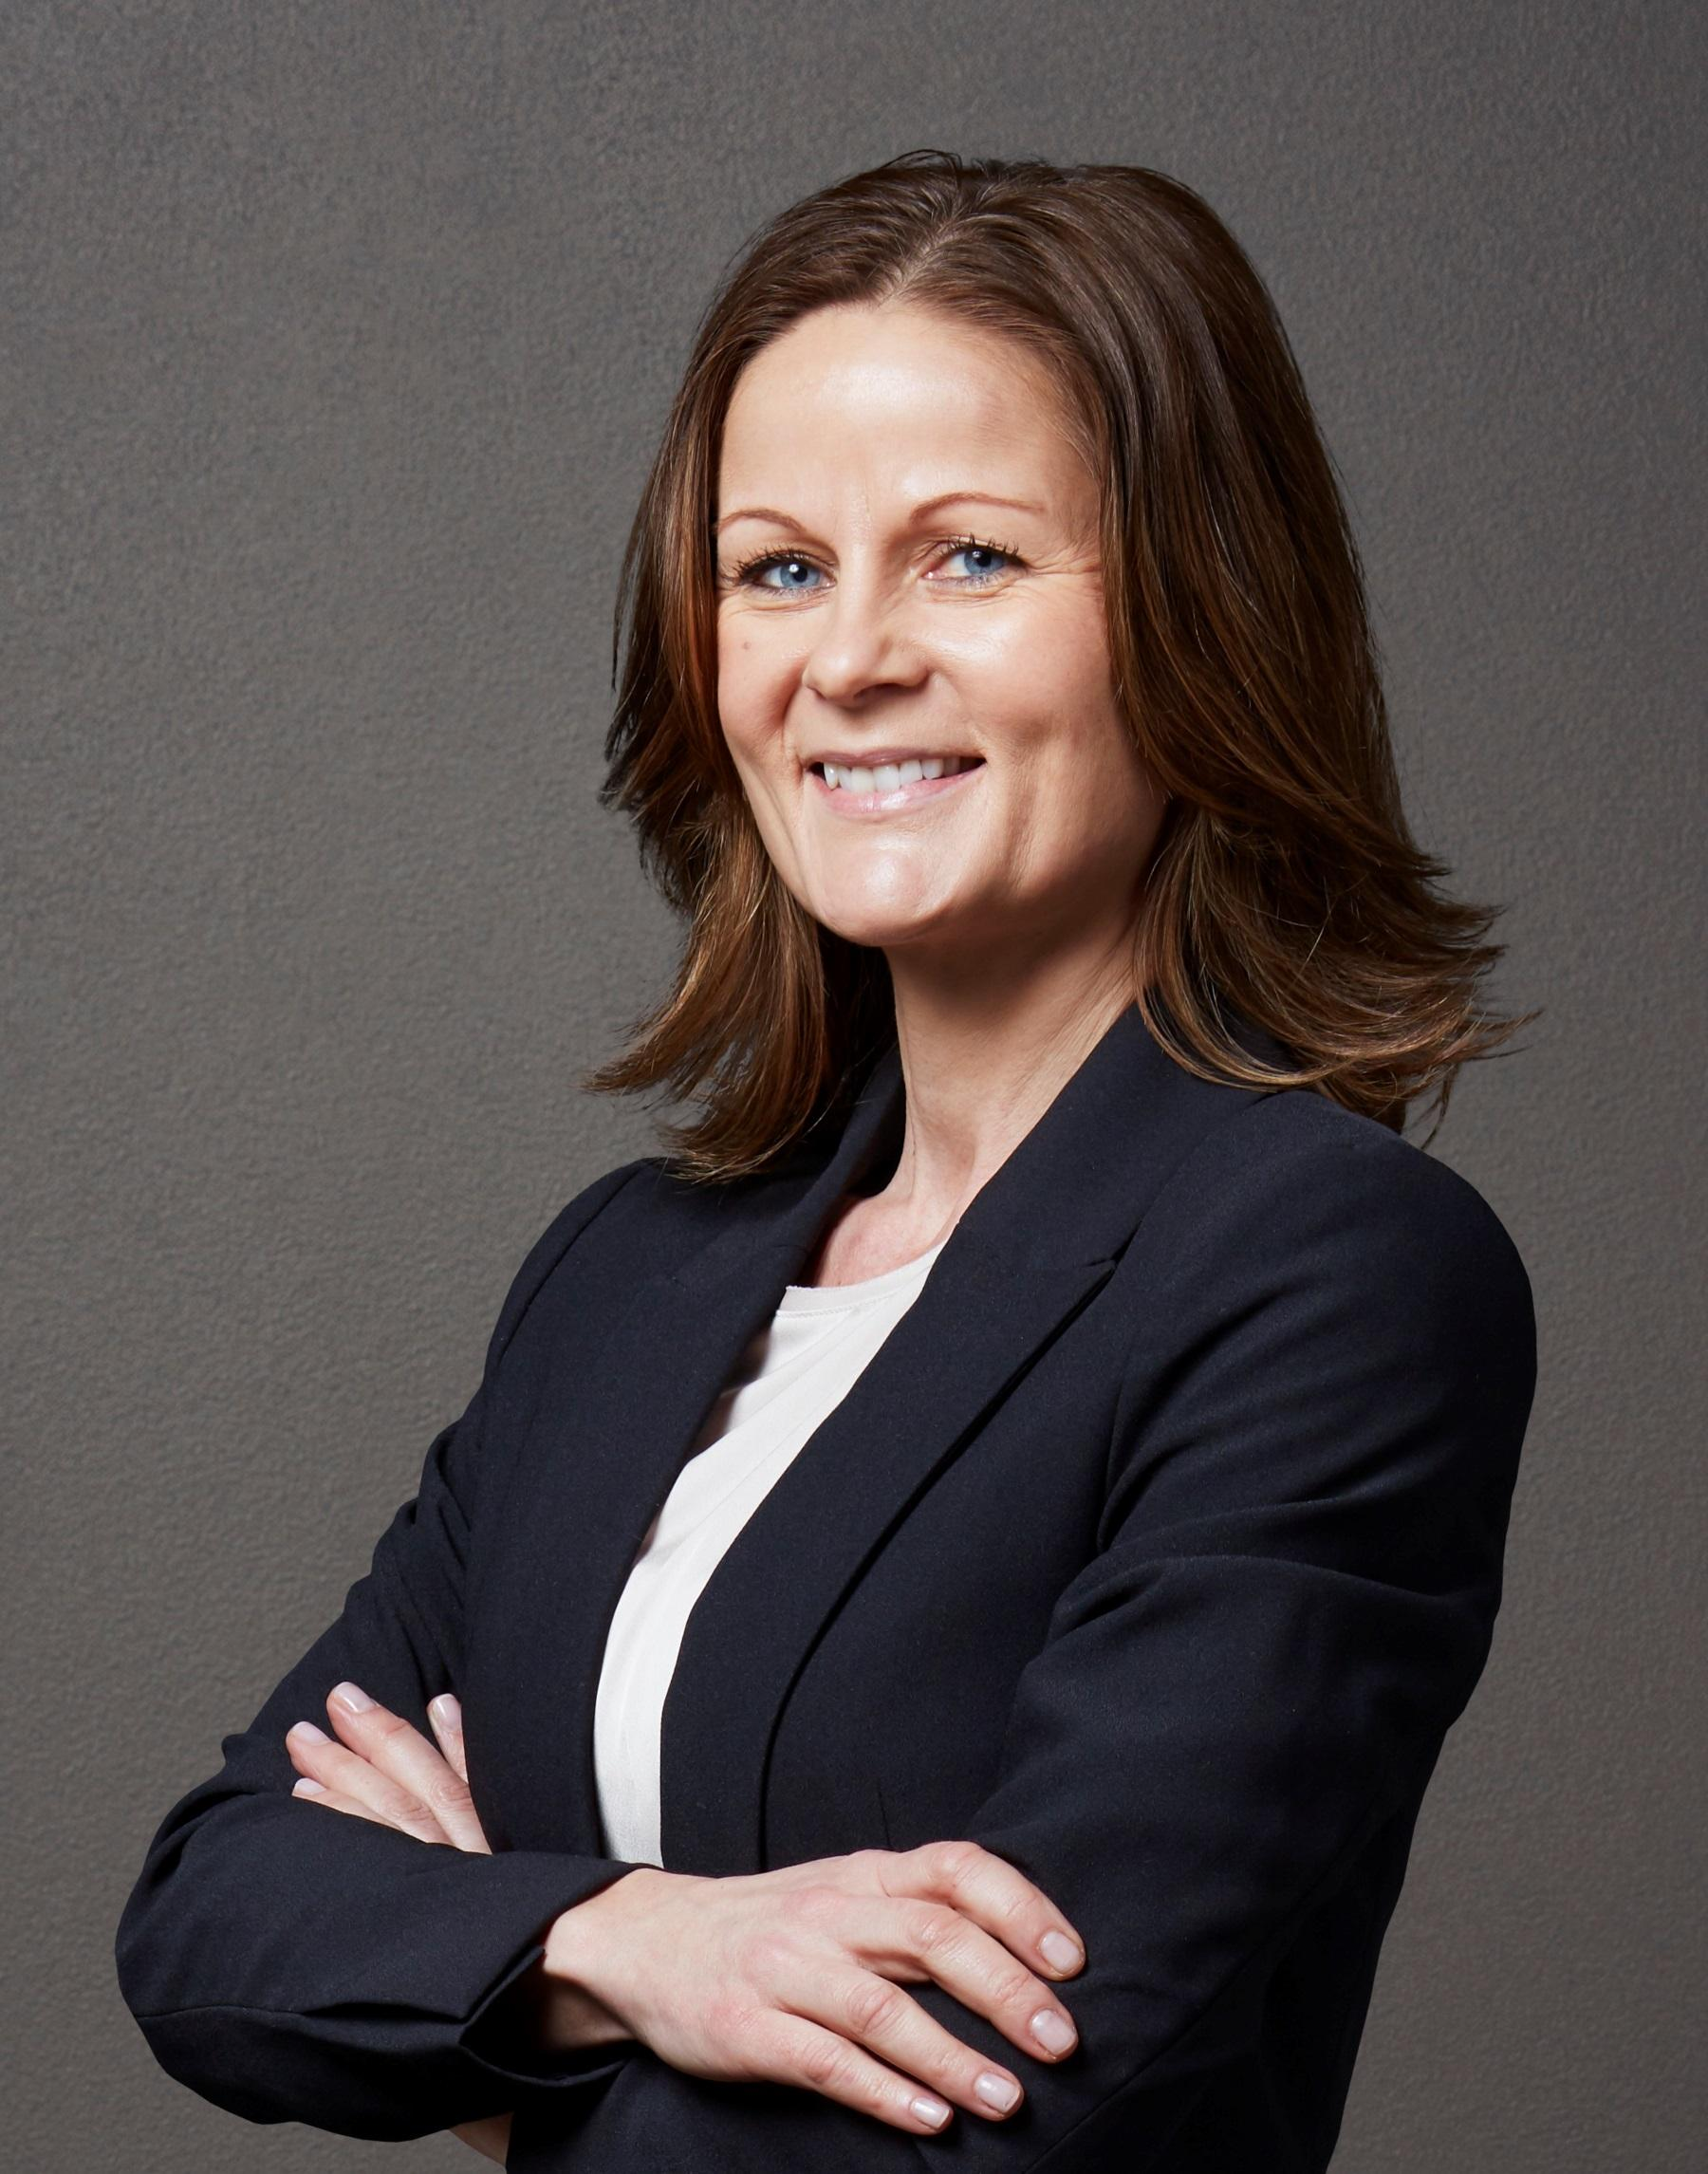 Ulrica Carlsson